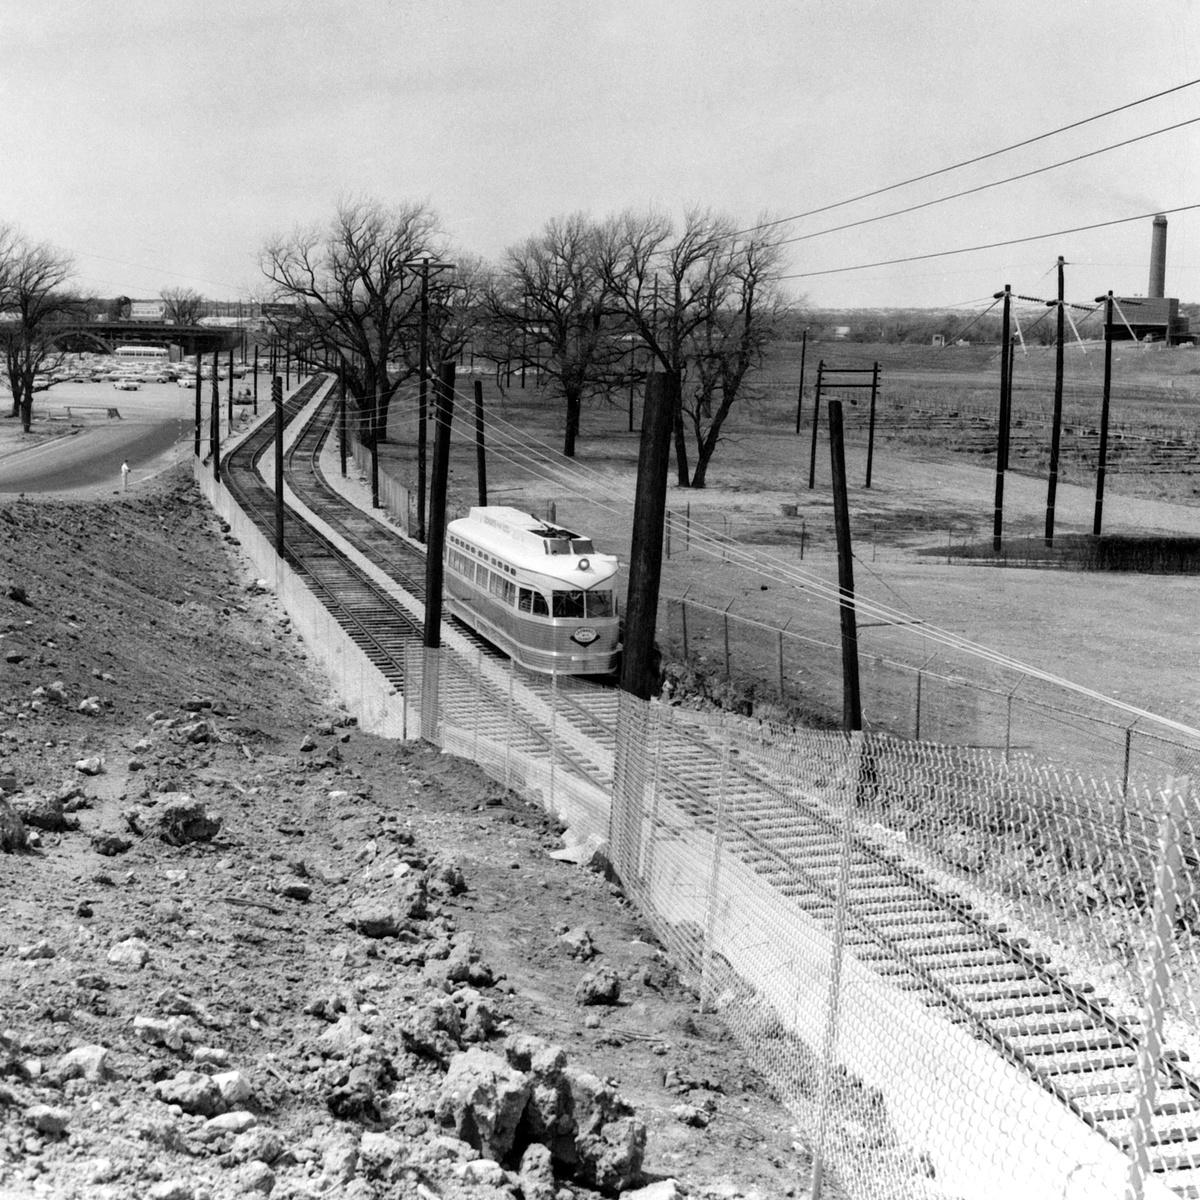 (652k, 1200x1200)<br><b>Country:</b> United States<br><b>City:</b> Fort Worth, TX<br><b>System:</b> Tandy Subway<br><b>Collection of:</b> David Pirmann<br><b>Date:</b> 4/1963<br><b>Notes:</b> Leonards Subway PCC cars<br><b>Viewed (this week/total):</b> 4 / 44